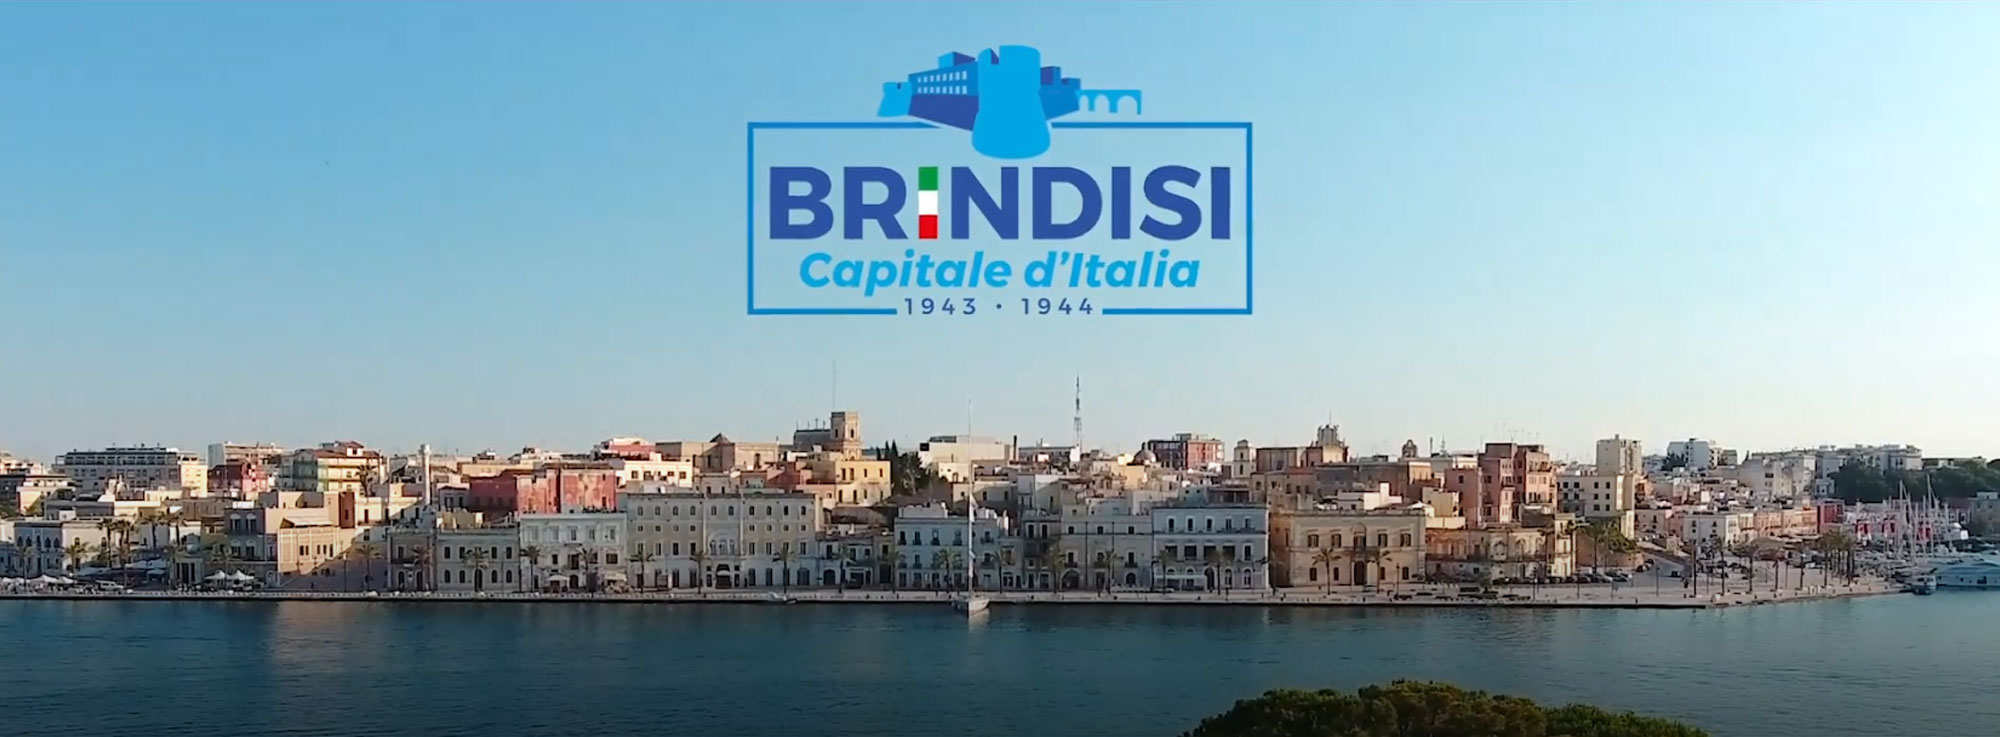 Brindisi: Brindisi Capitale d'Italia